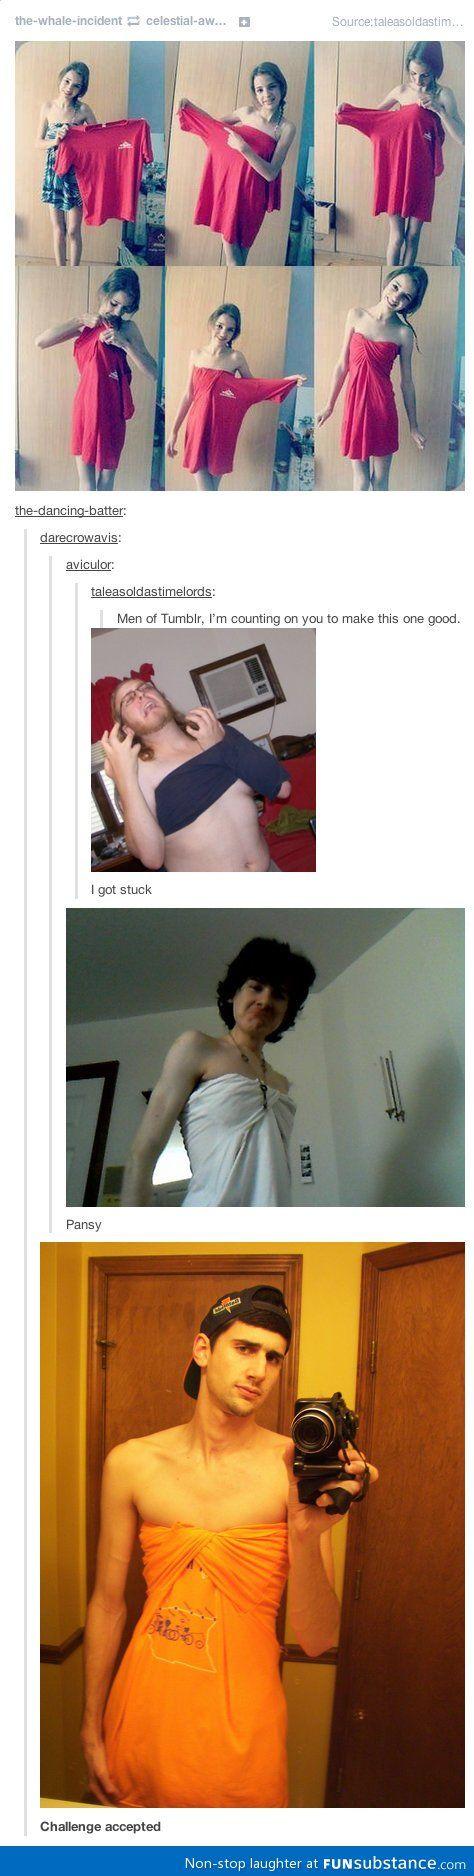 Folding a t-shirt into a dress